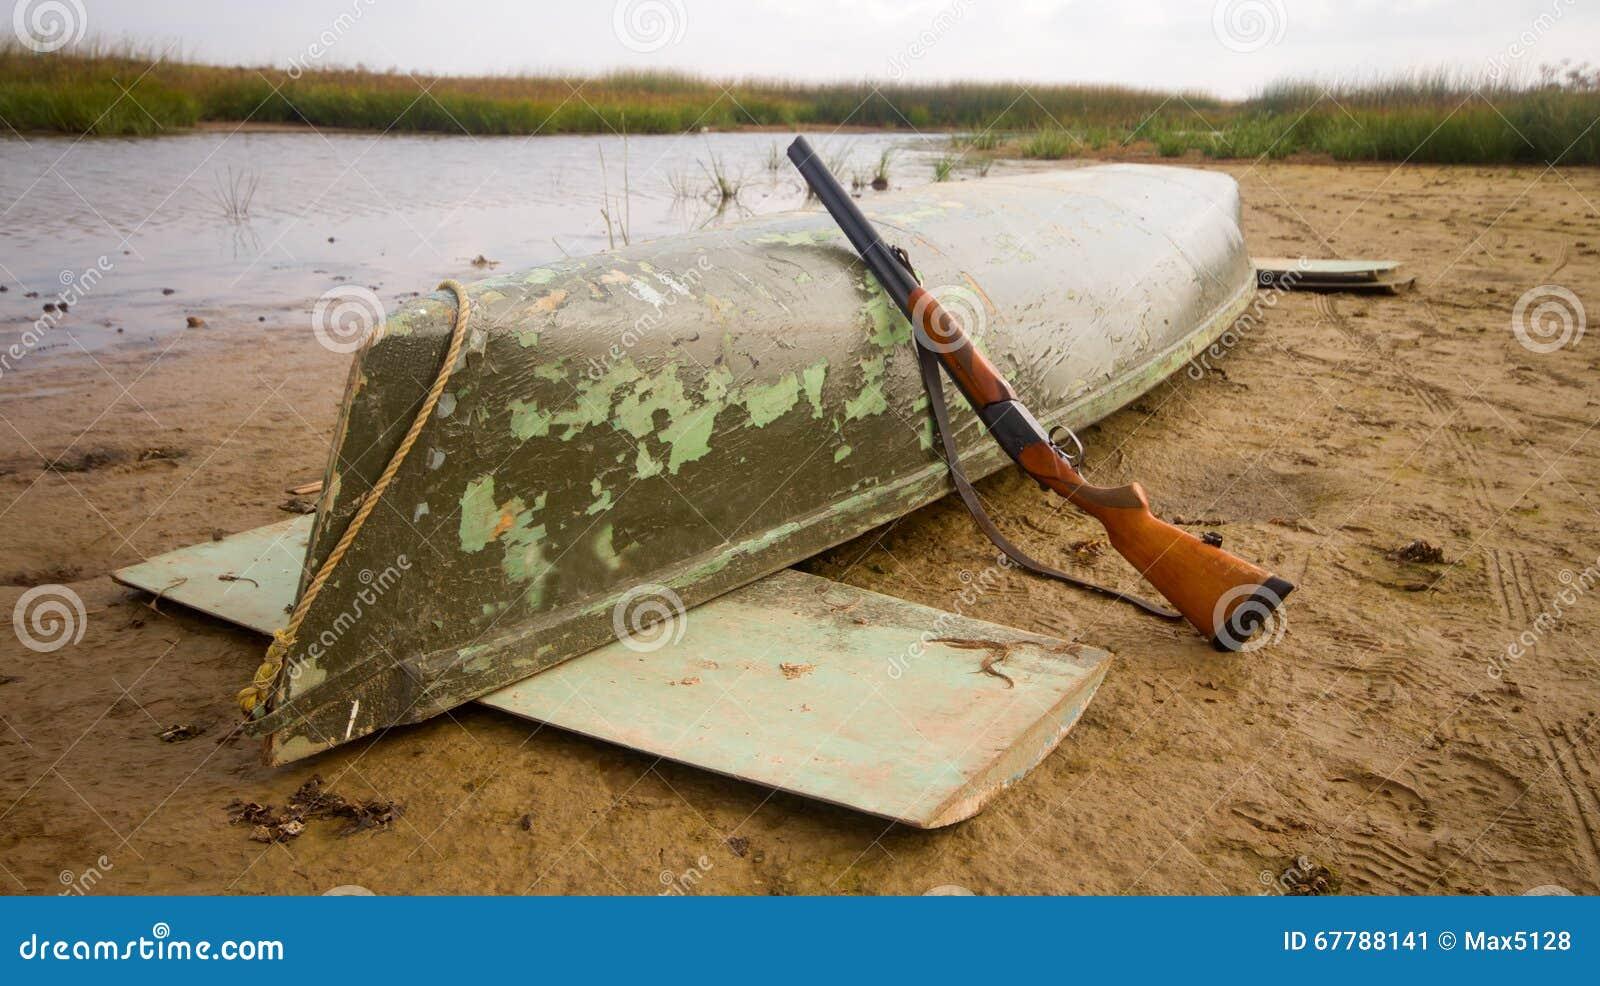 Quipement principal de chasseur peu exigeant de canards - Equipement de chasse ...